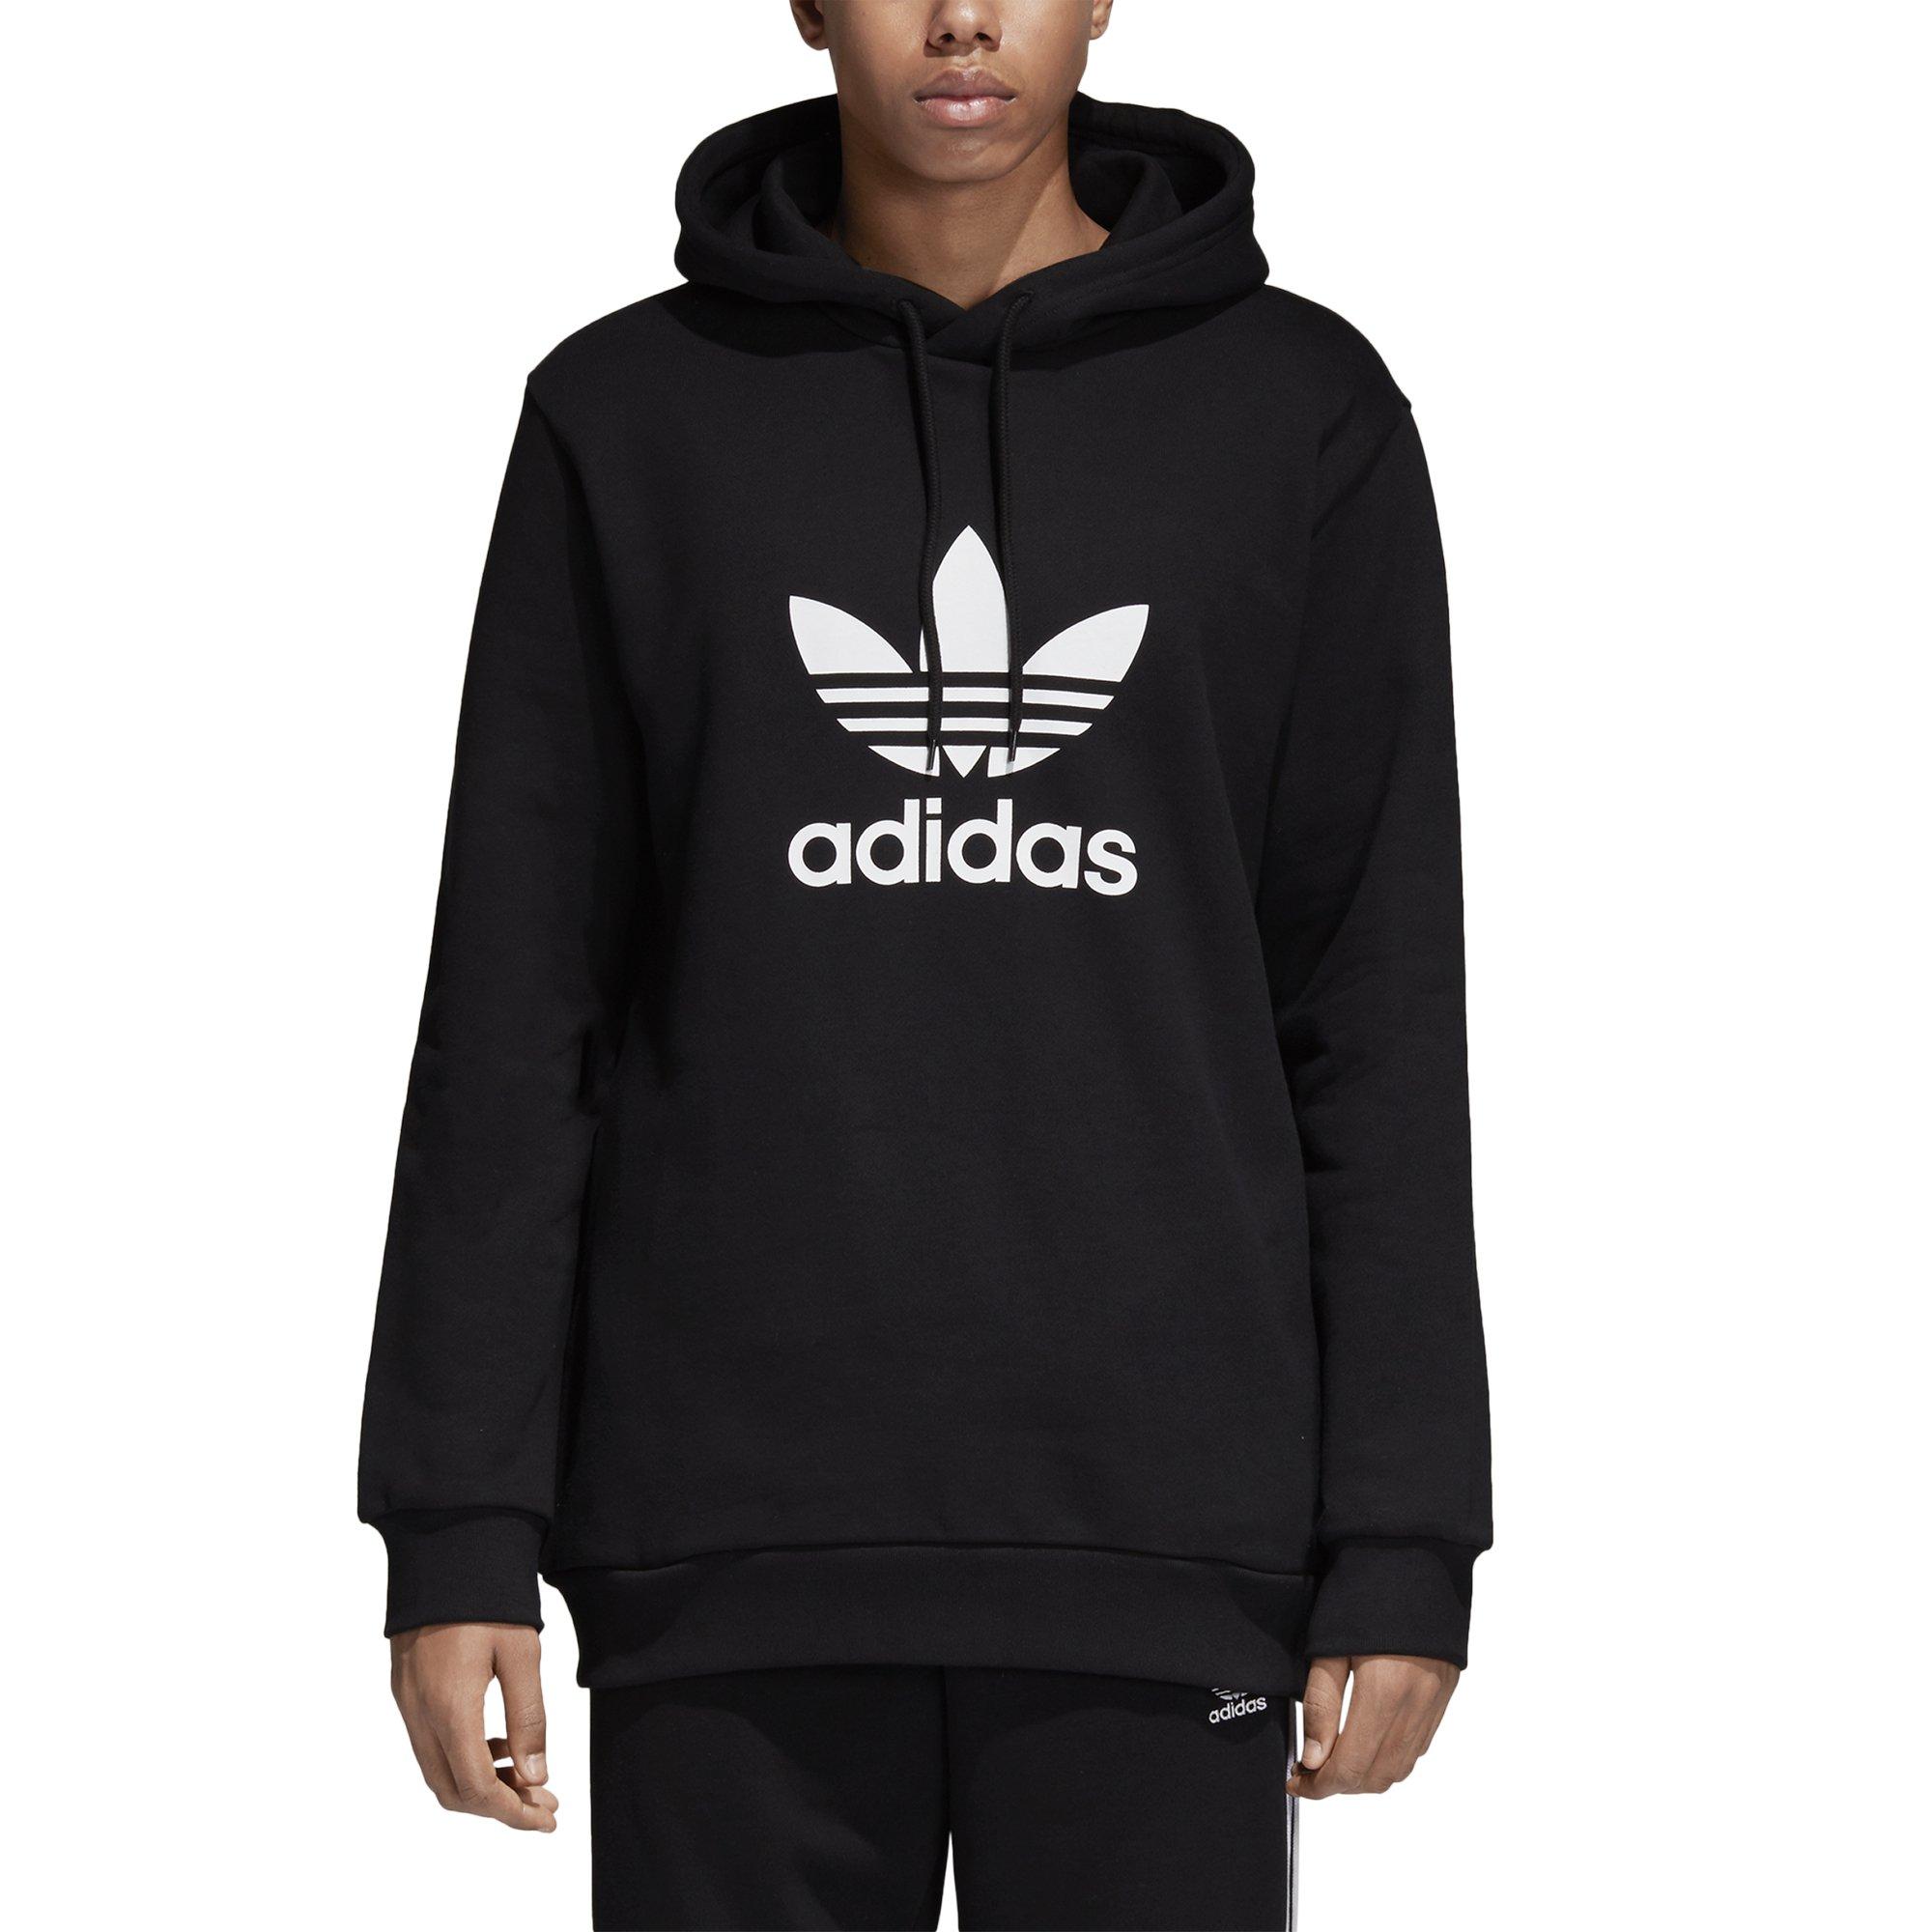 adidas Originals Men's Trefoil Hoodie, Black, Small